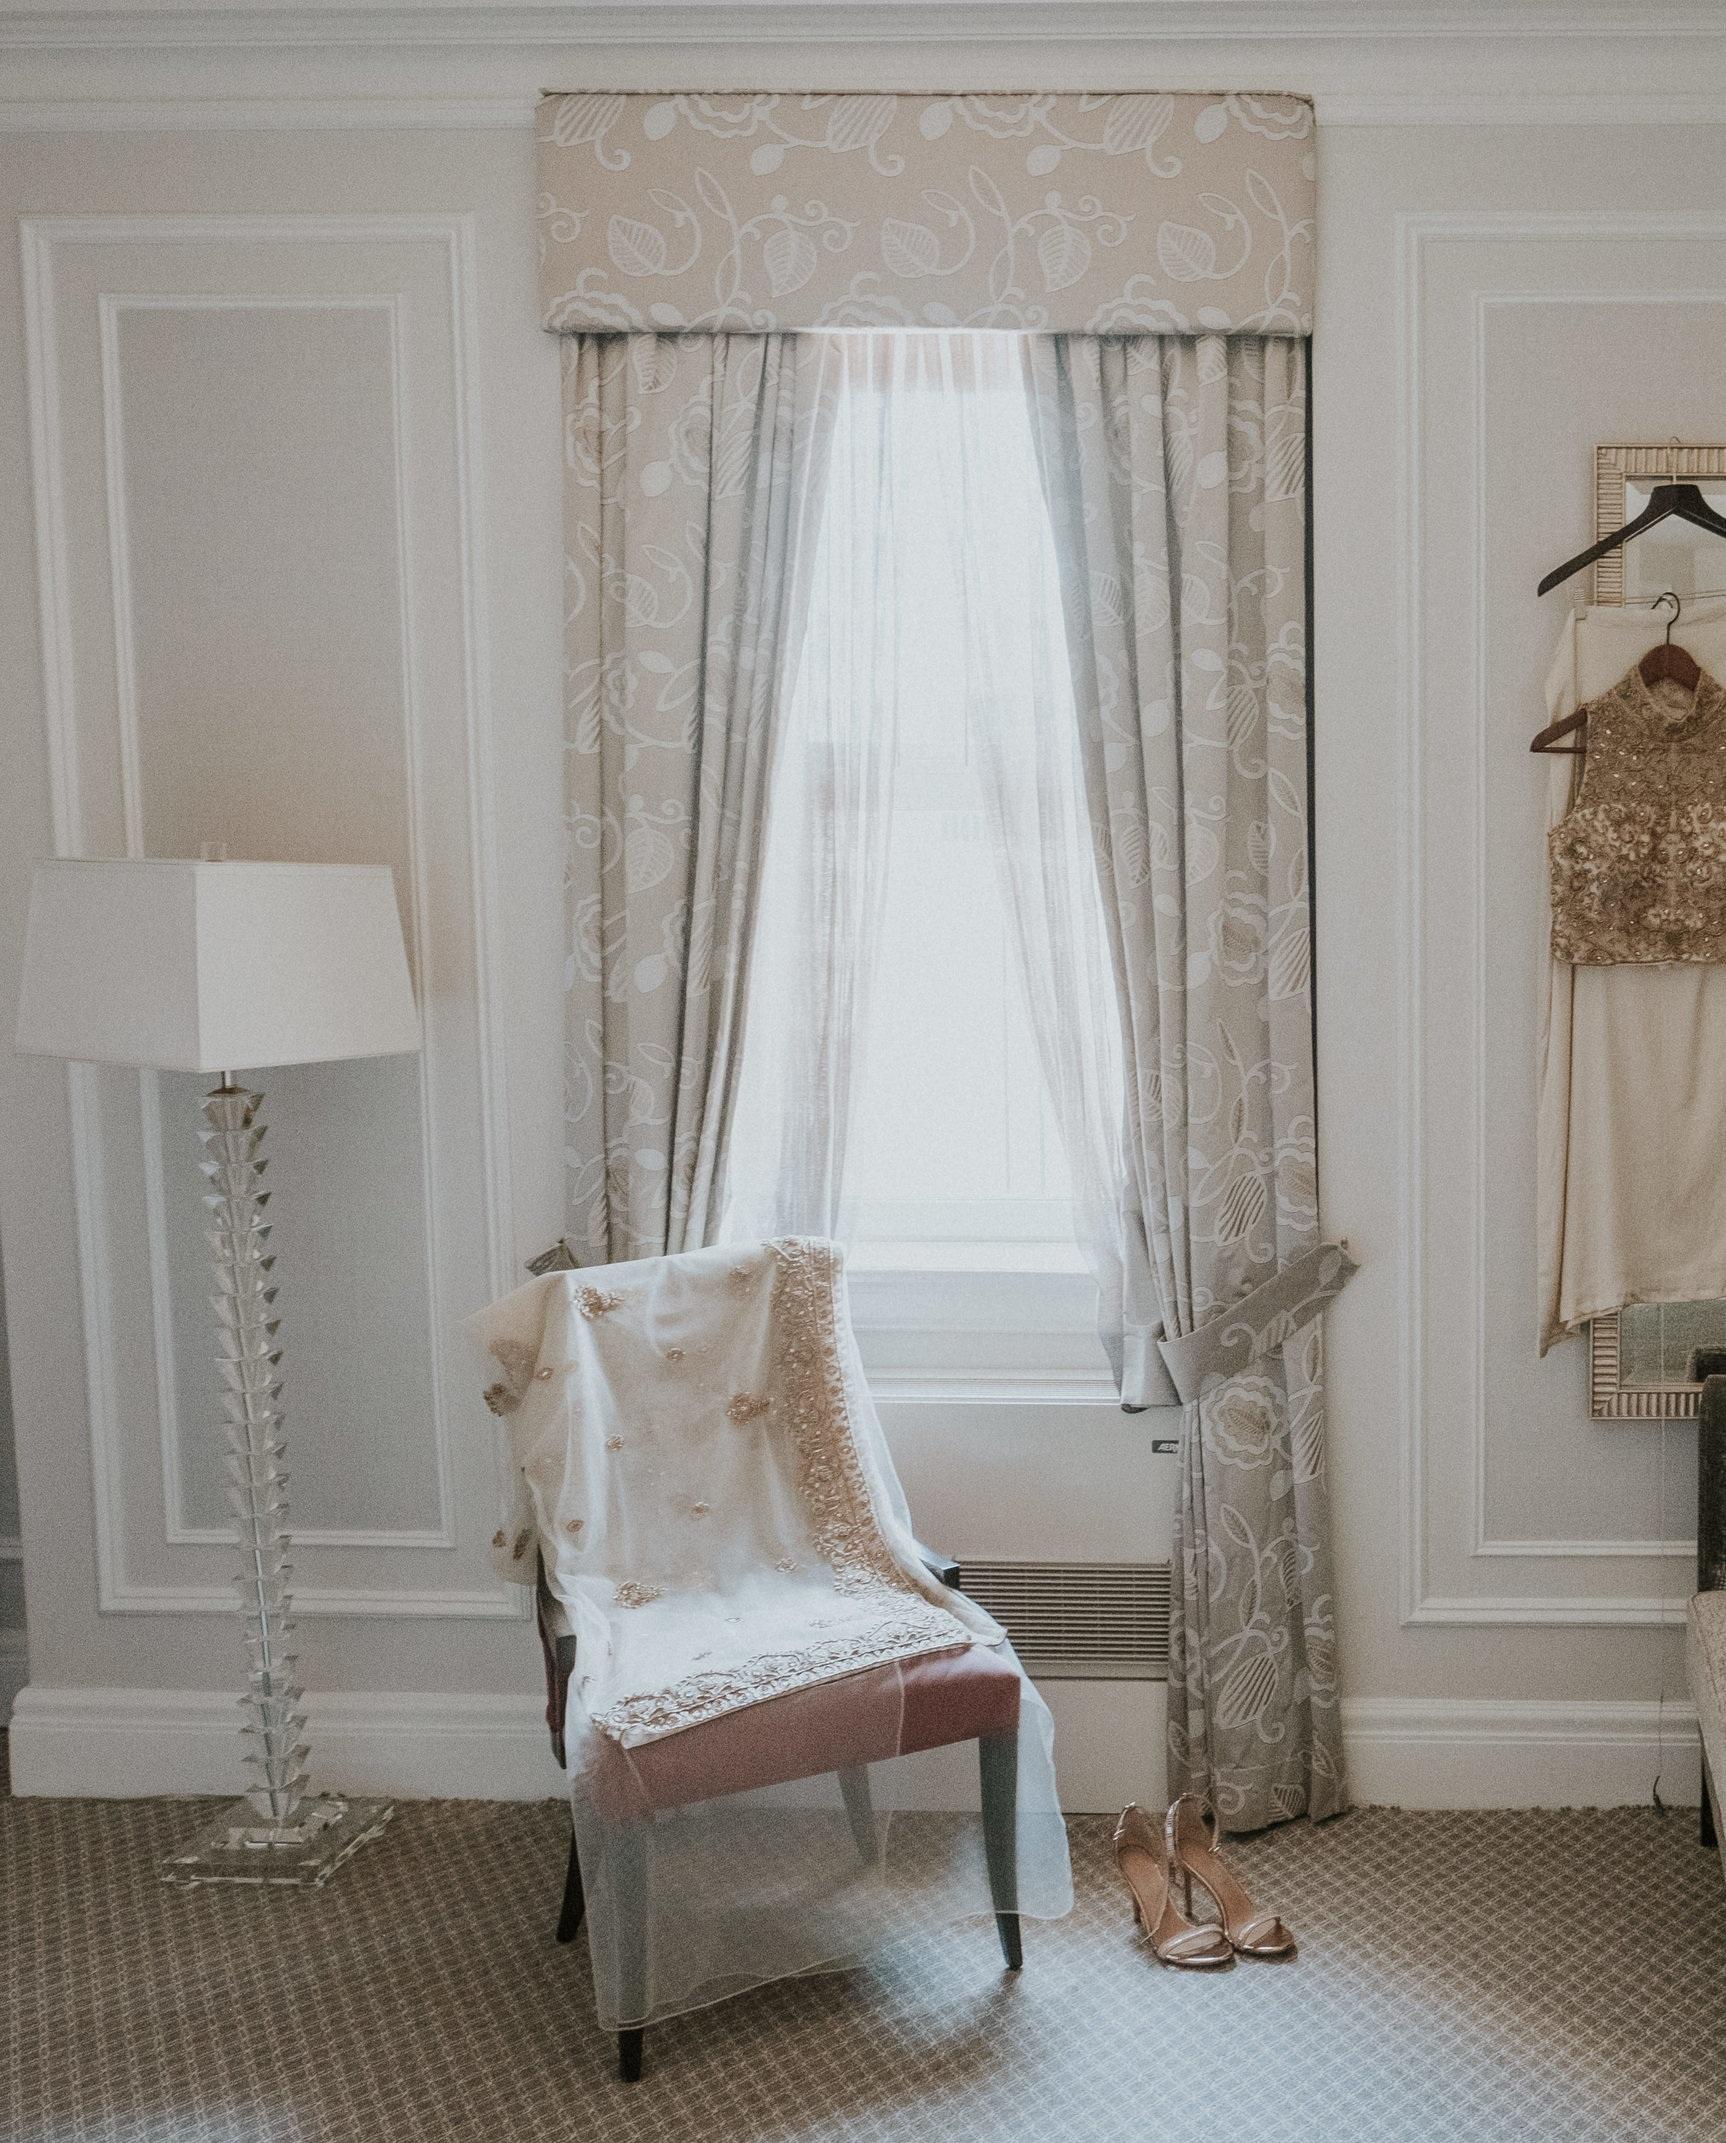 Komal+Minhas+Wedding+Chateau+Laurier%2C+Toast+Events